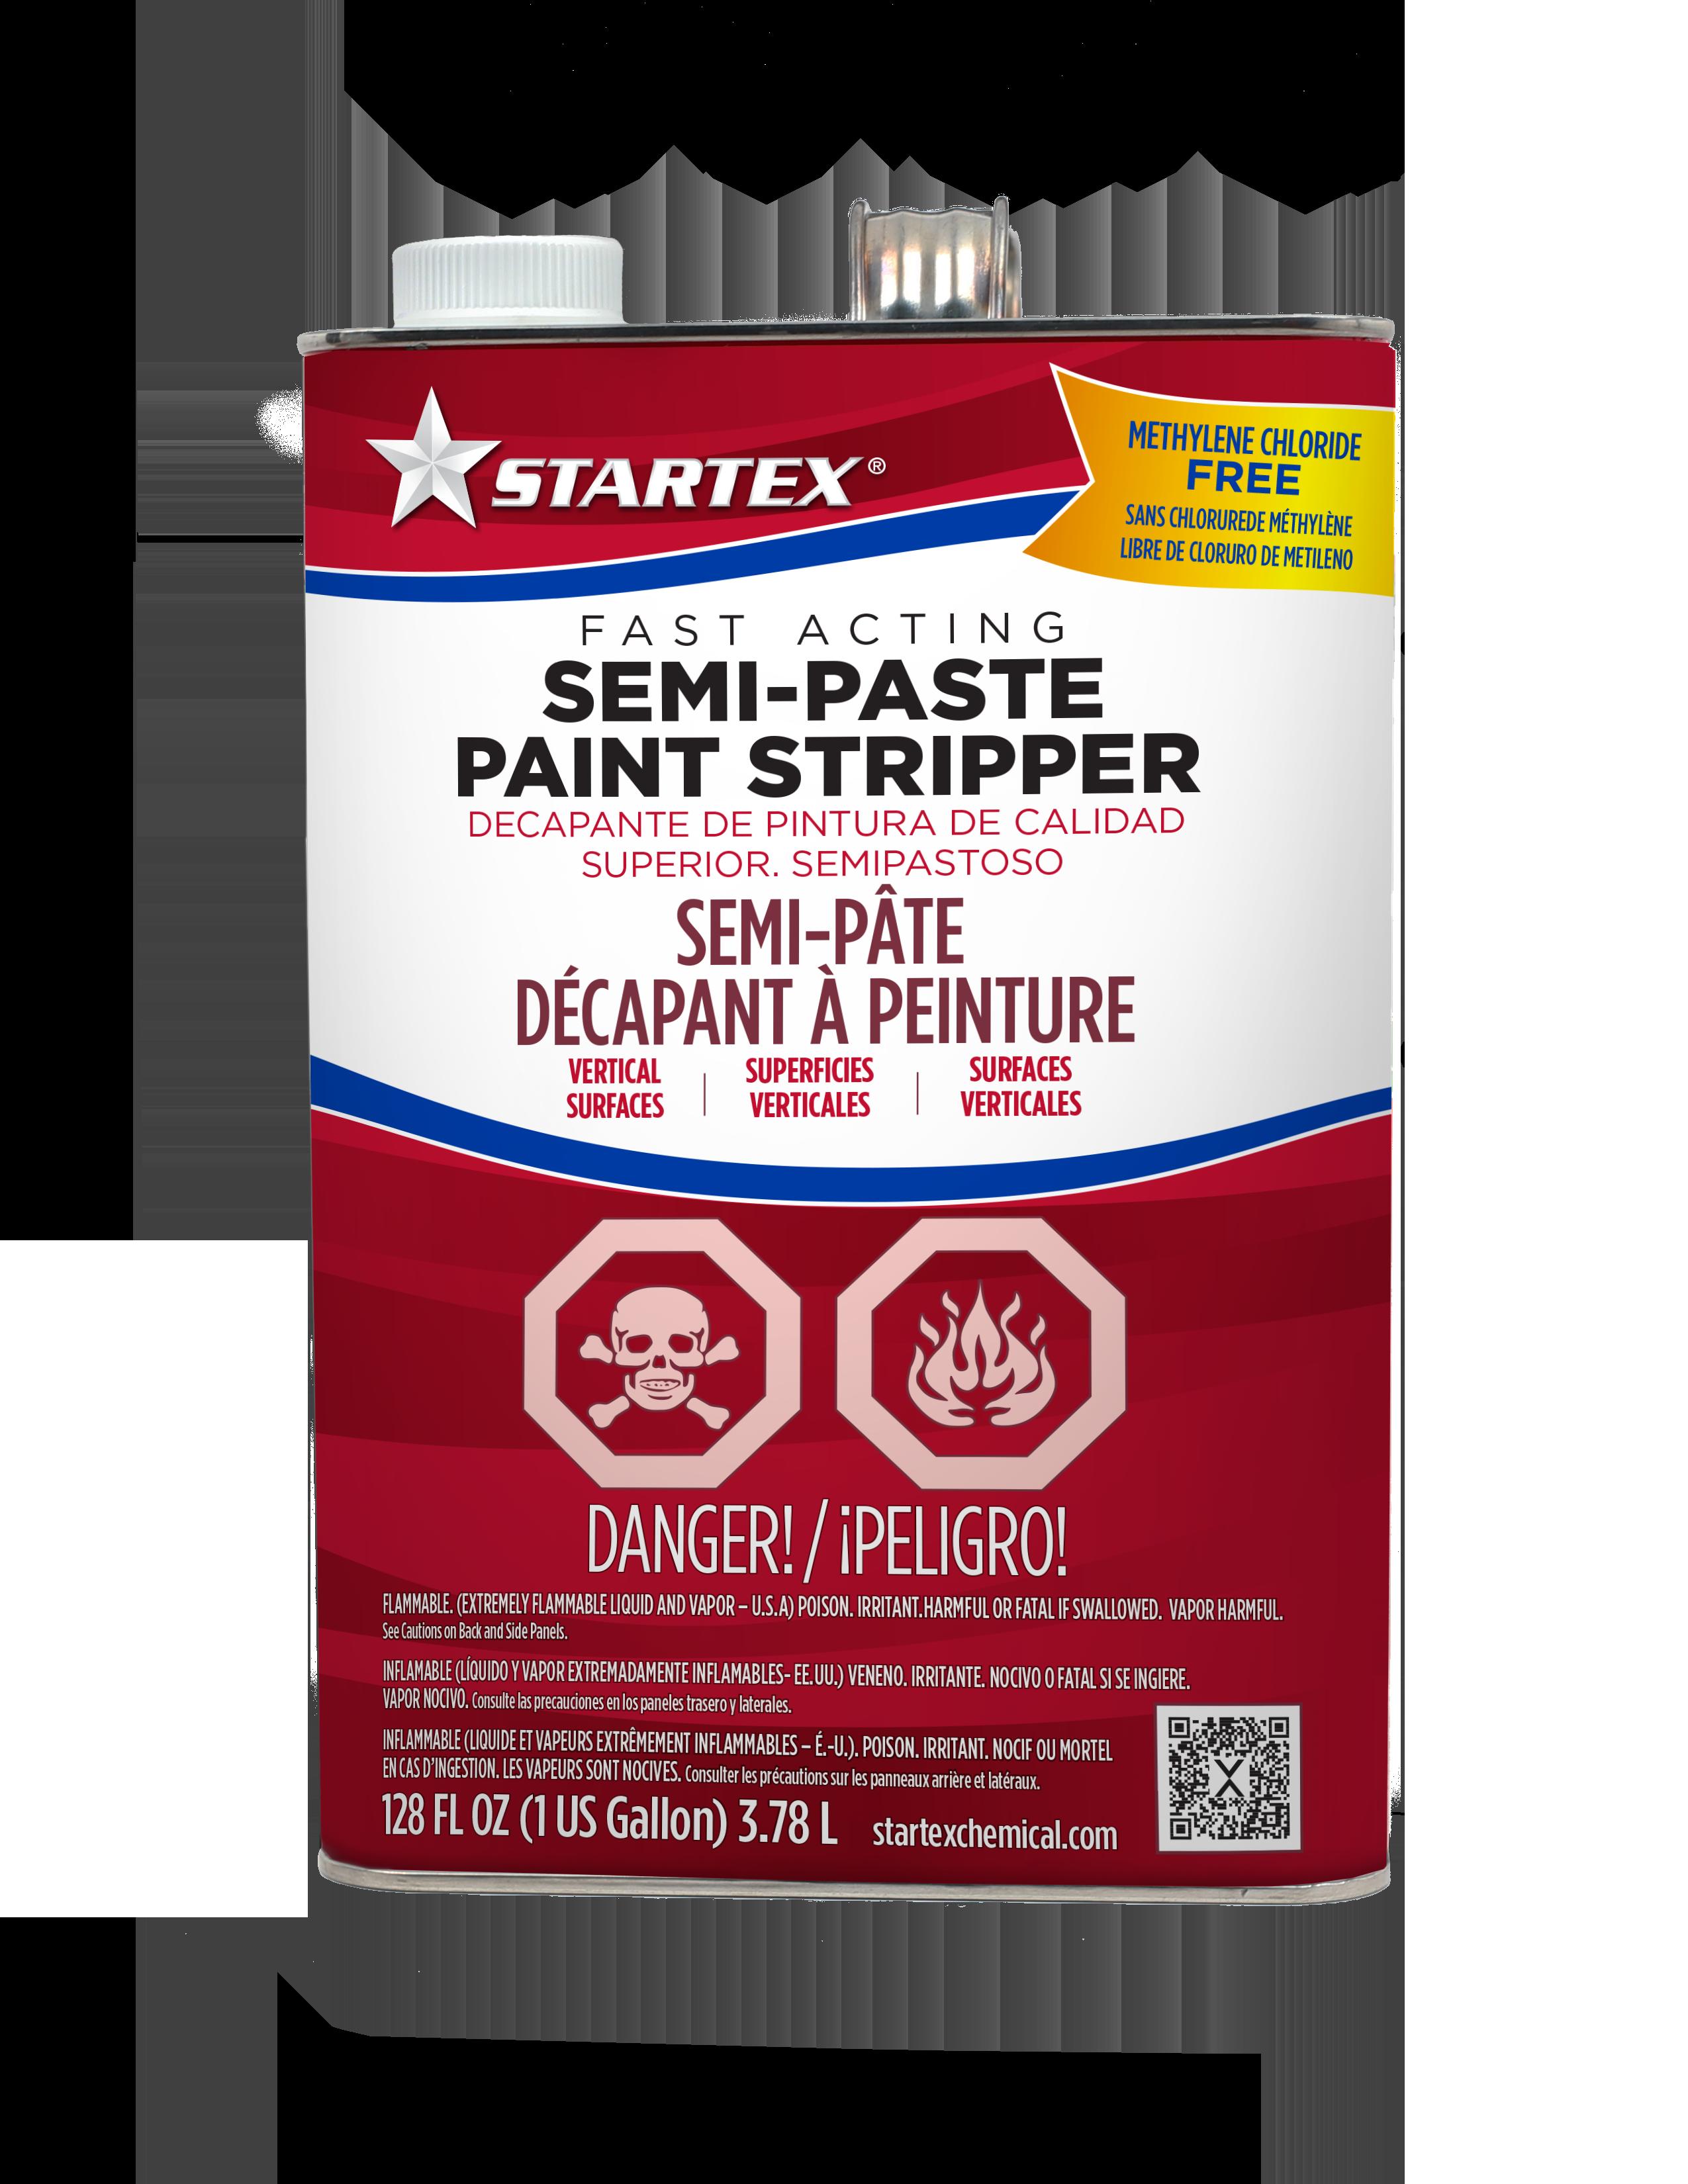 meythlene chloride free semi past paint stripper